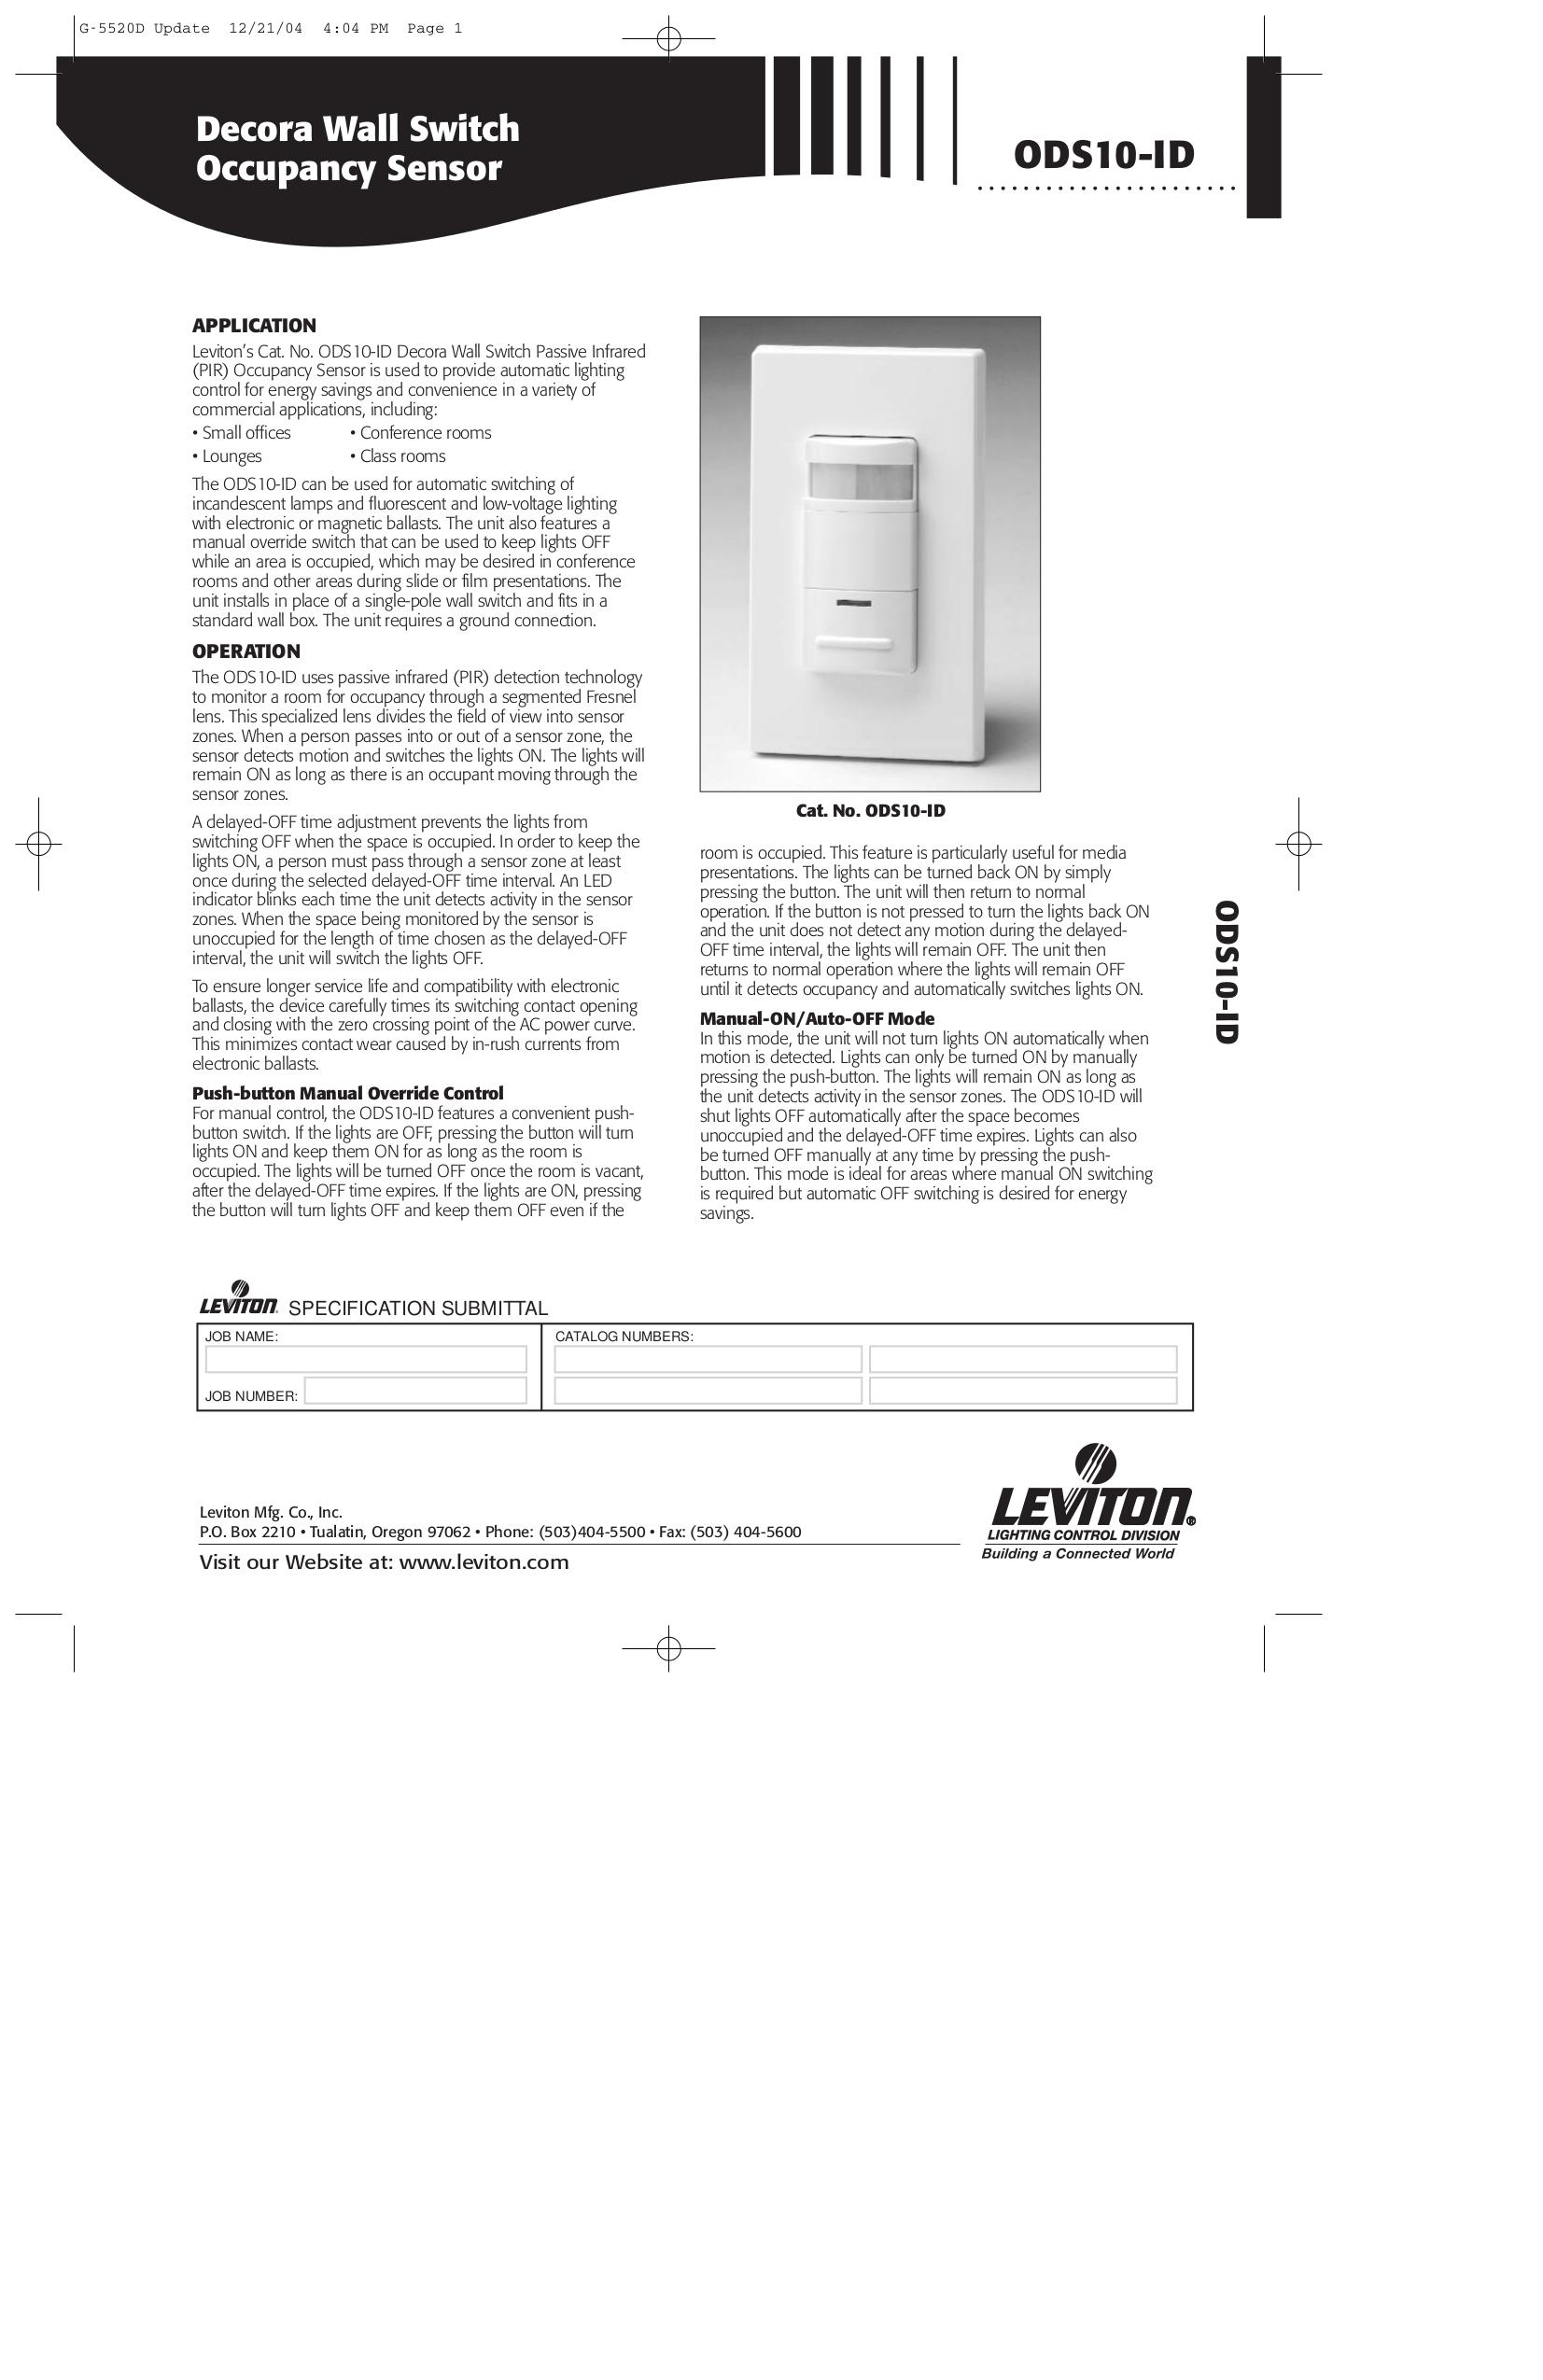 Comfortable Leviton Lighting Controls Manual Images - Simple Wiring ...